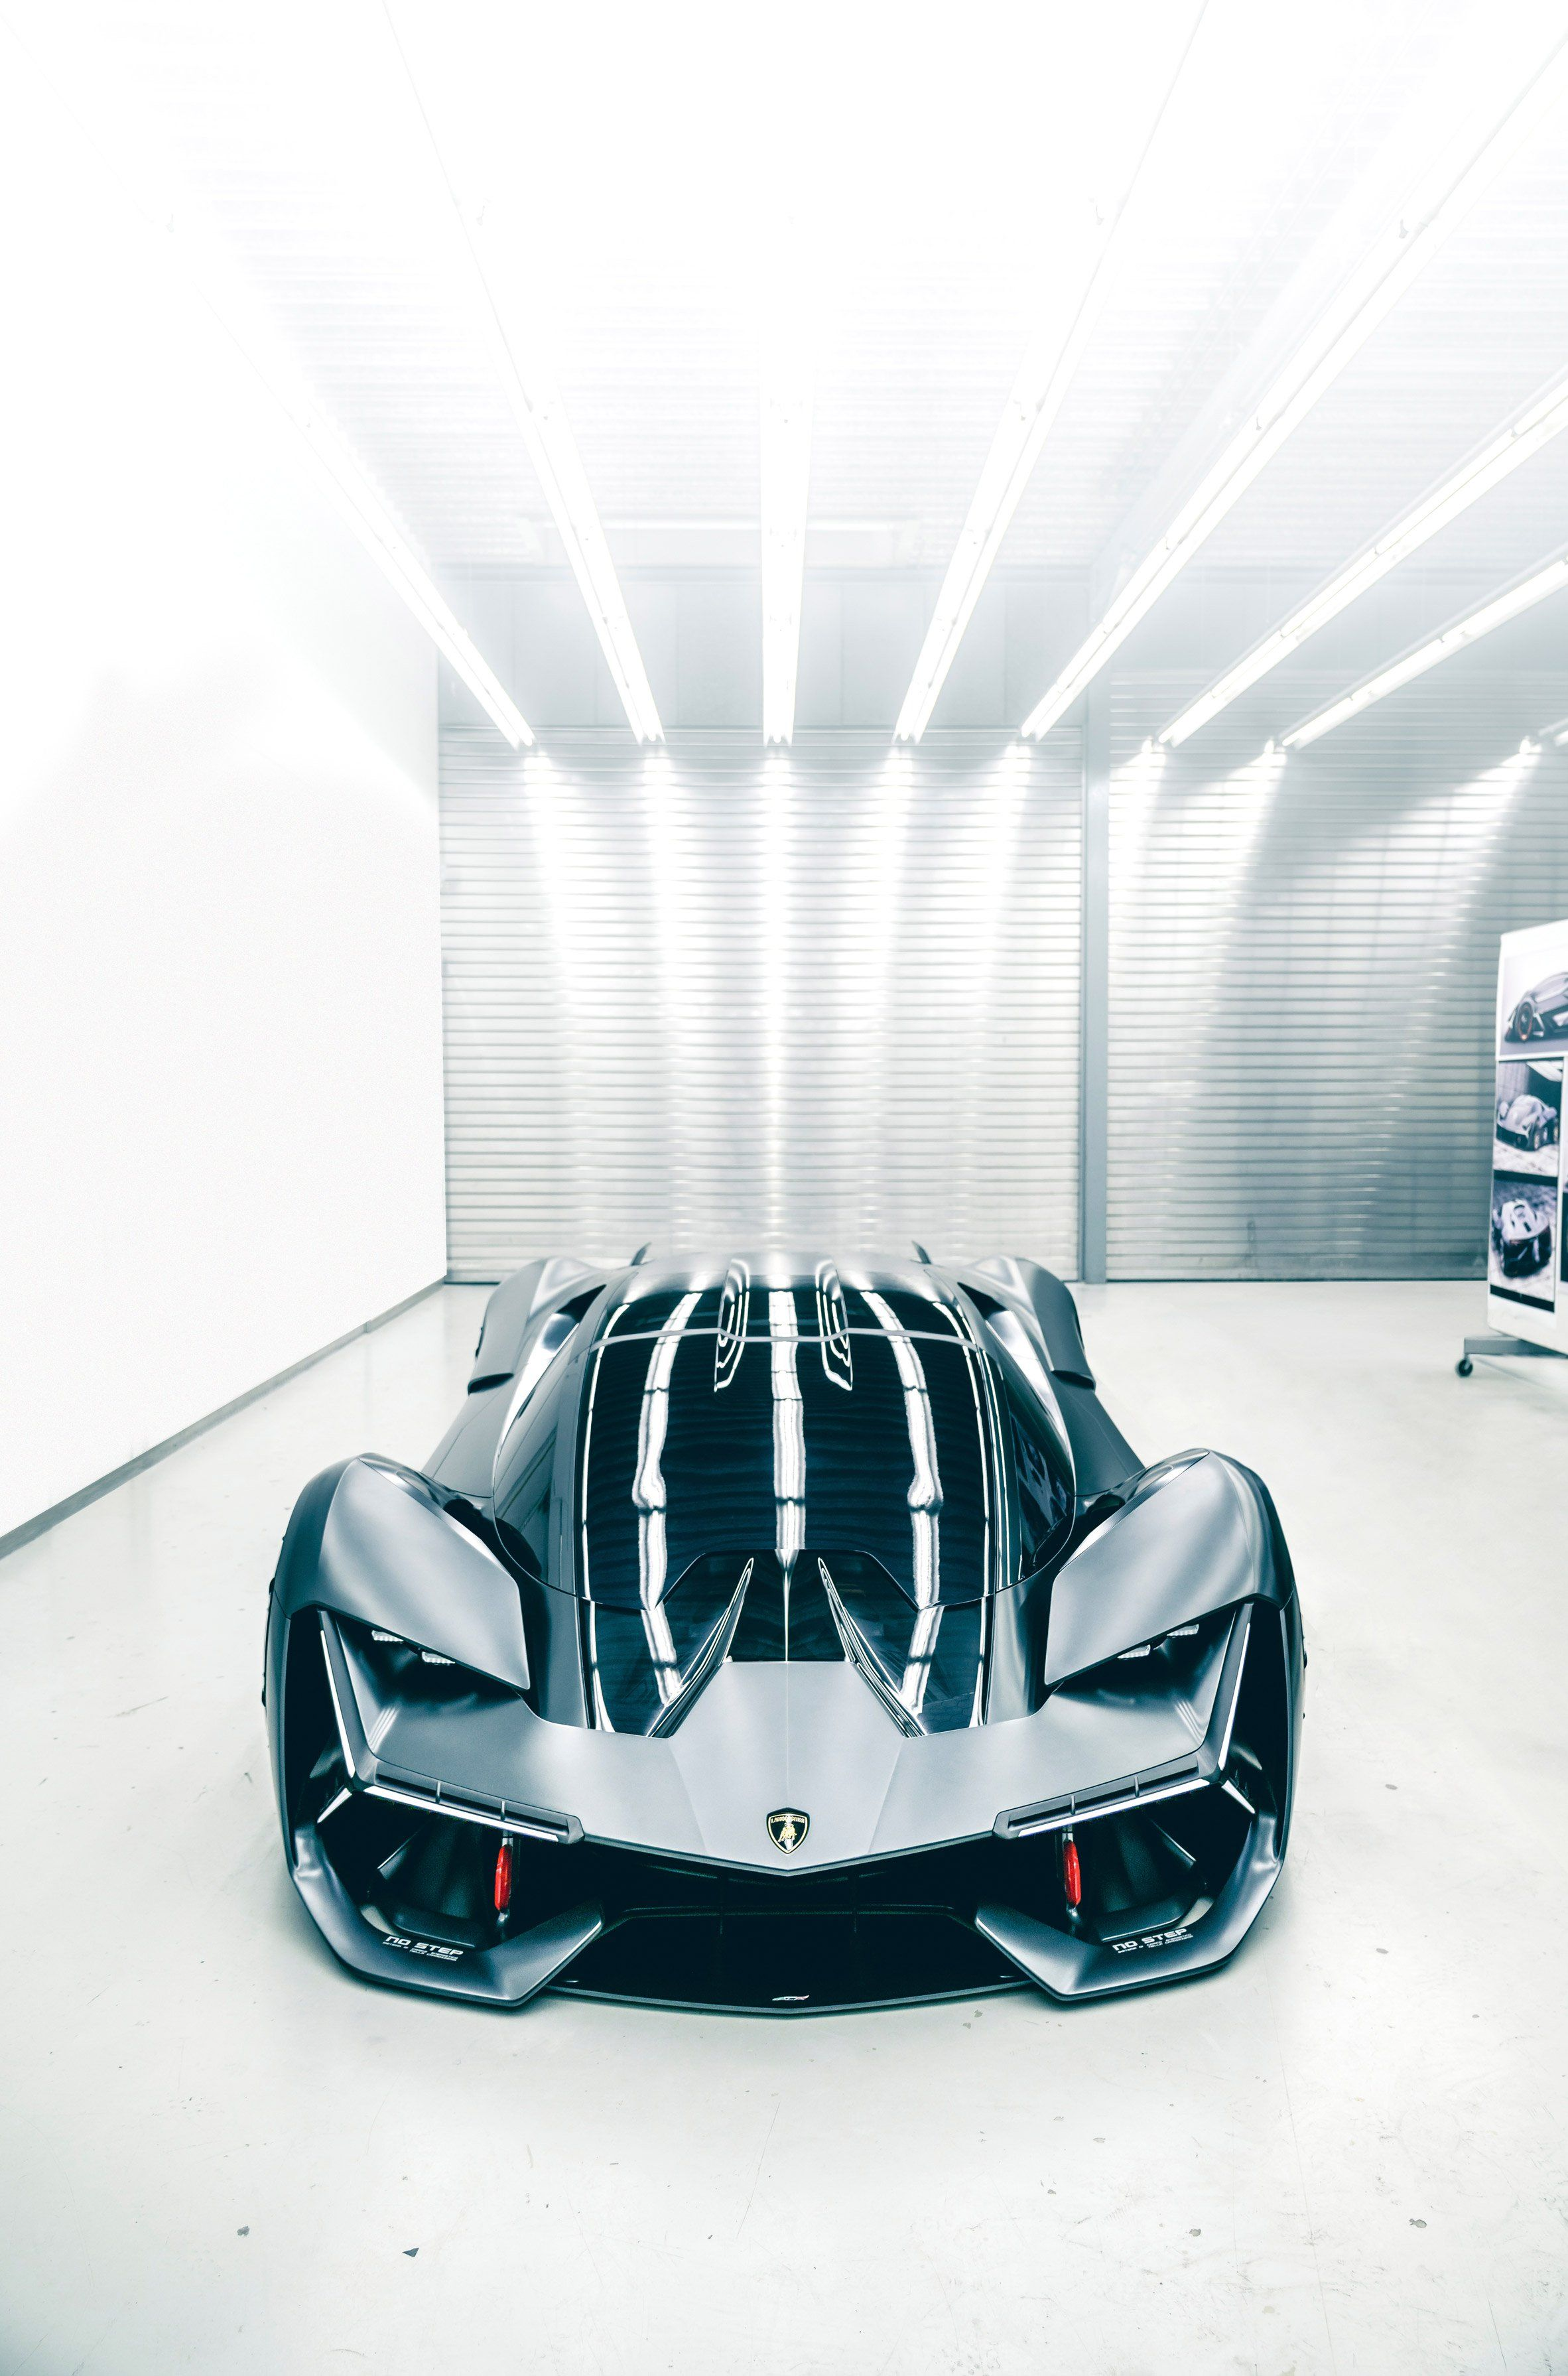 Lamborghini And Mit Redesign Sports Cars For The Third Millennium Sports Car Lamborghini Supercar Super Cars